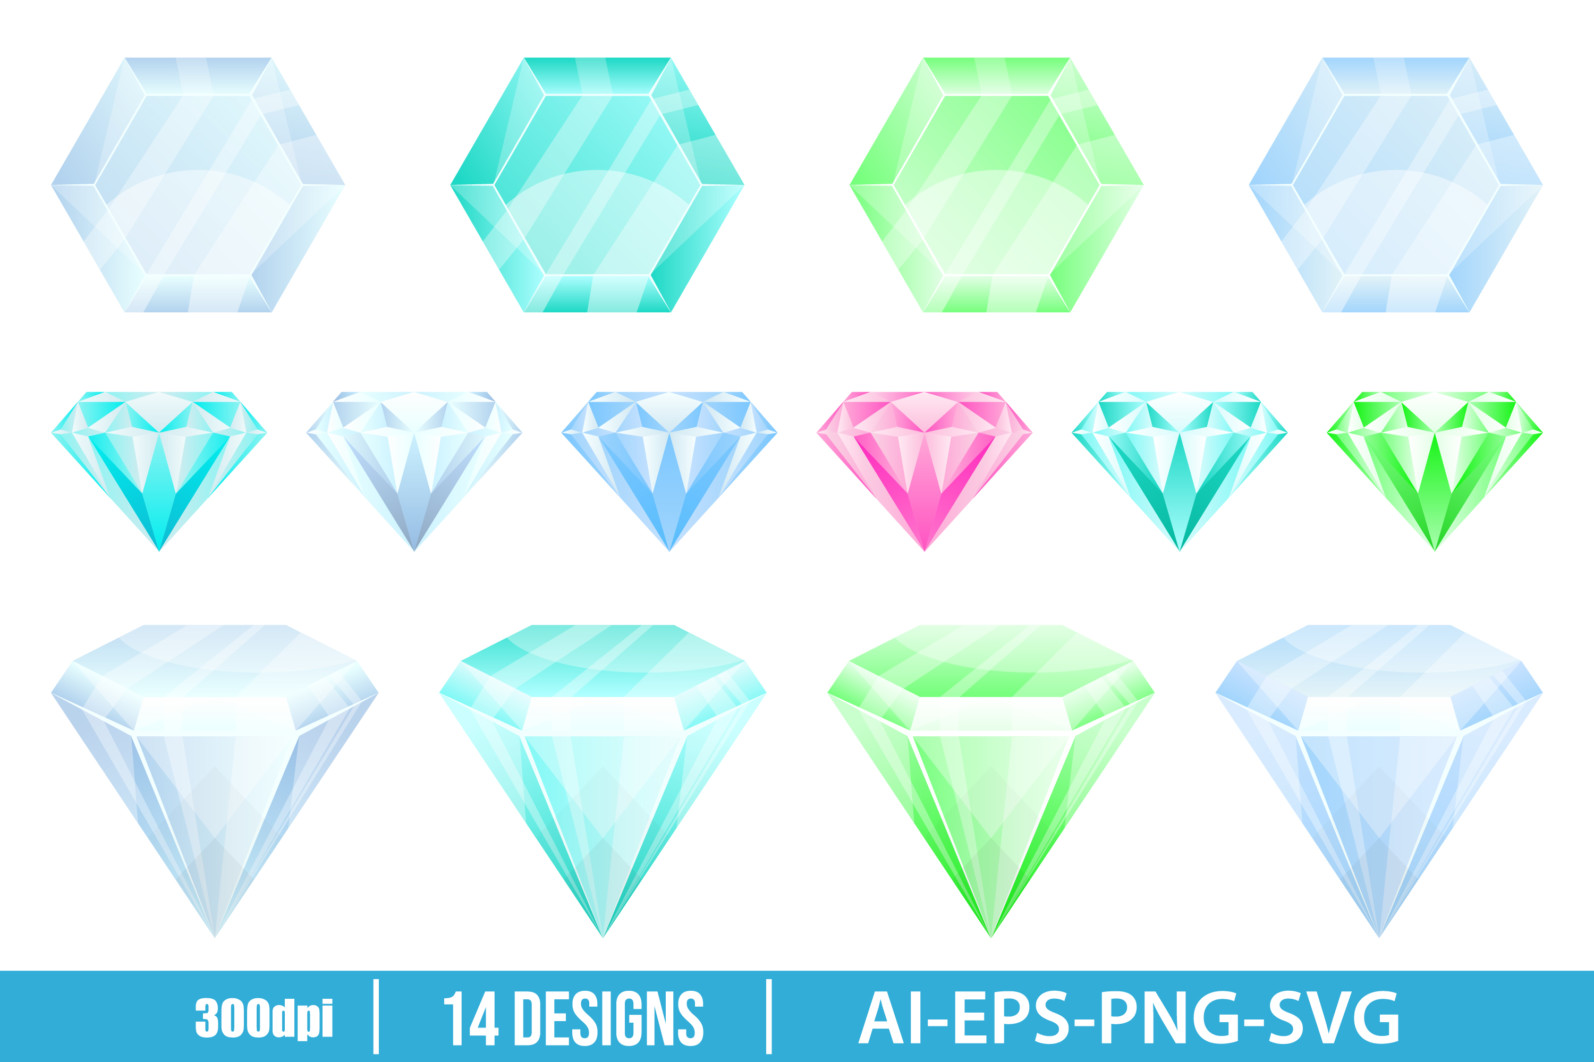 Diamond vector design illustration isolated on white background - DIAMOND scaled -